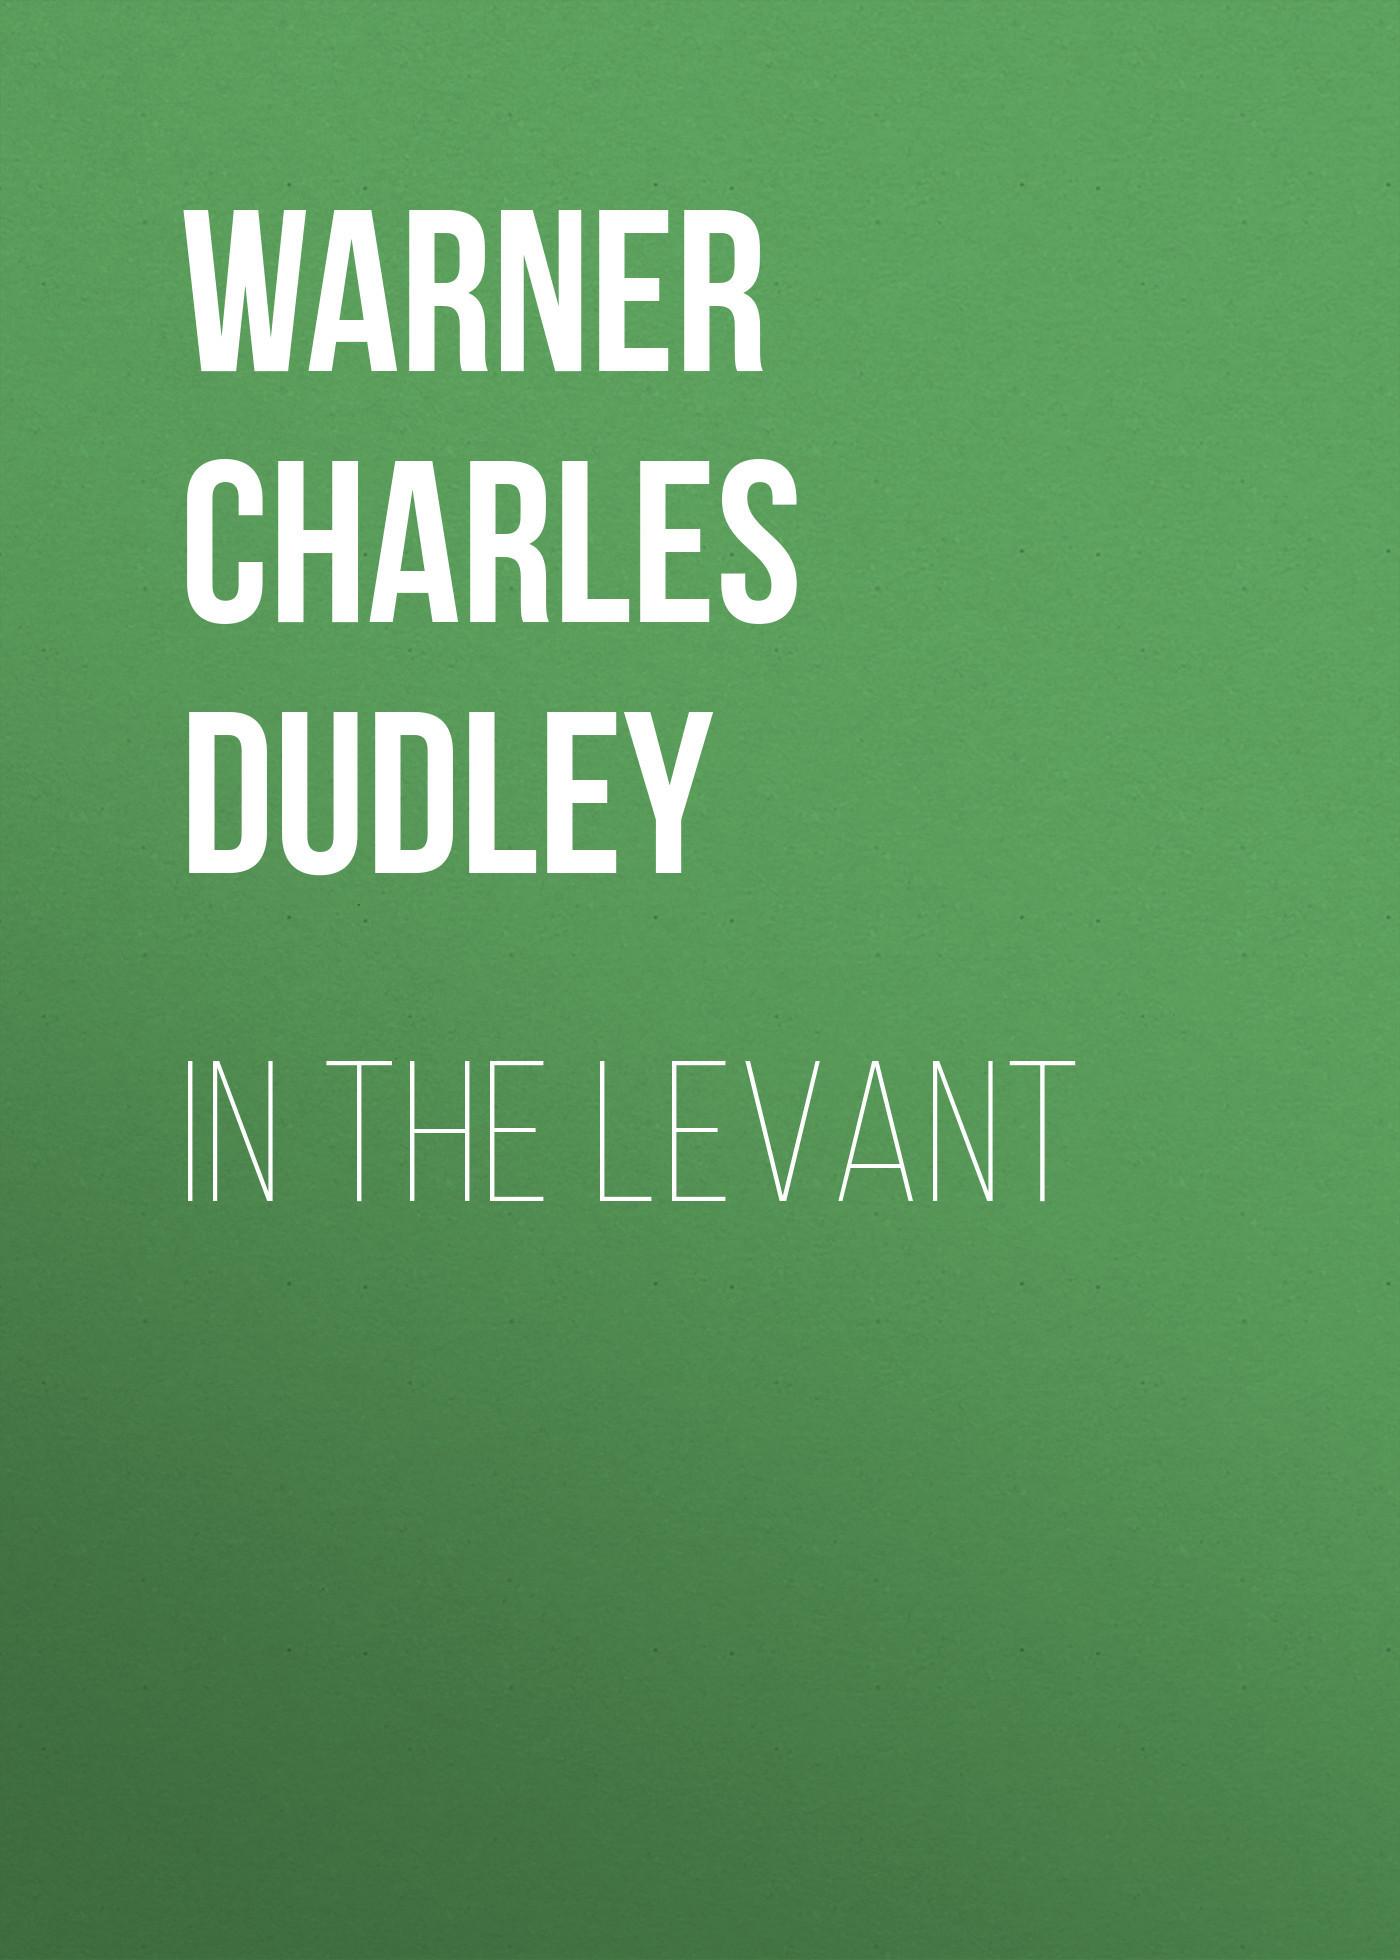 Warner Charles Dudley In The Levant warner charles dudley in the levant